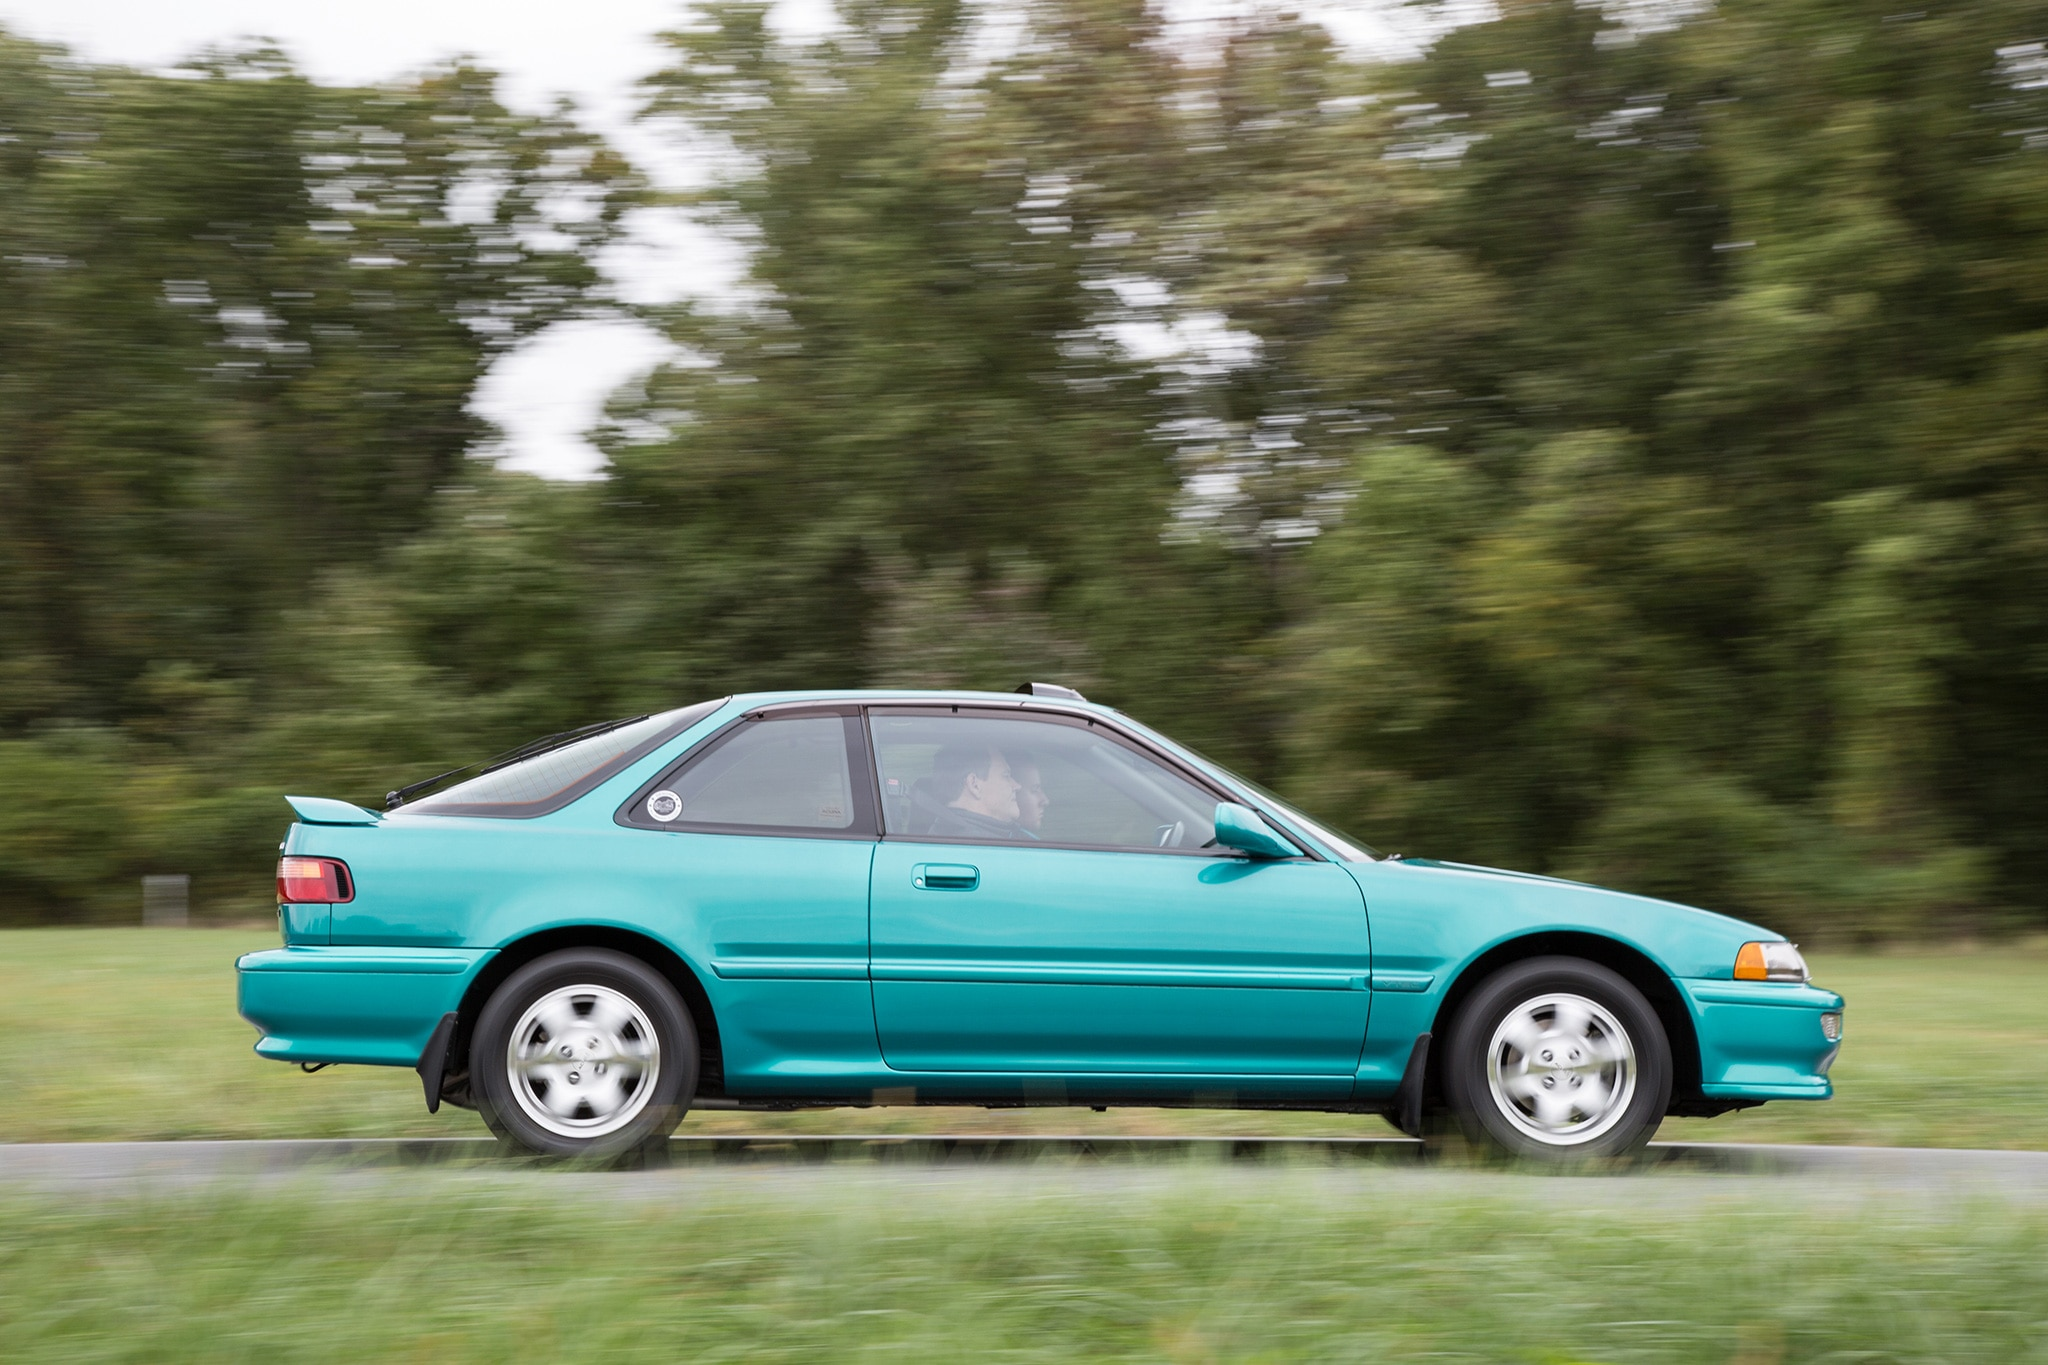 Acura Integra Gs R Side Profile In Motion on Acura Integra Gsr